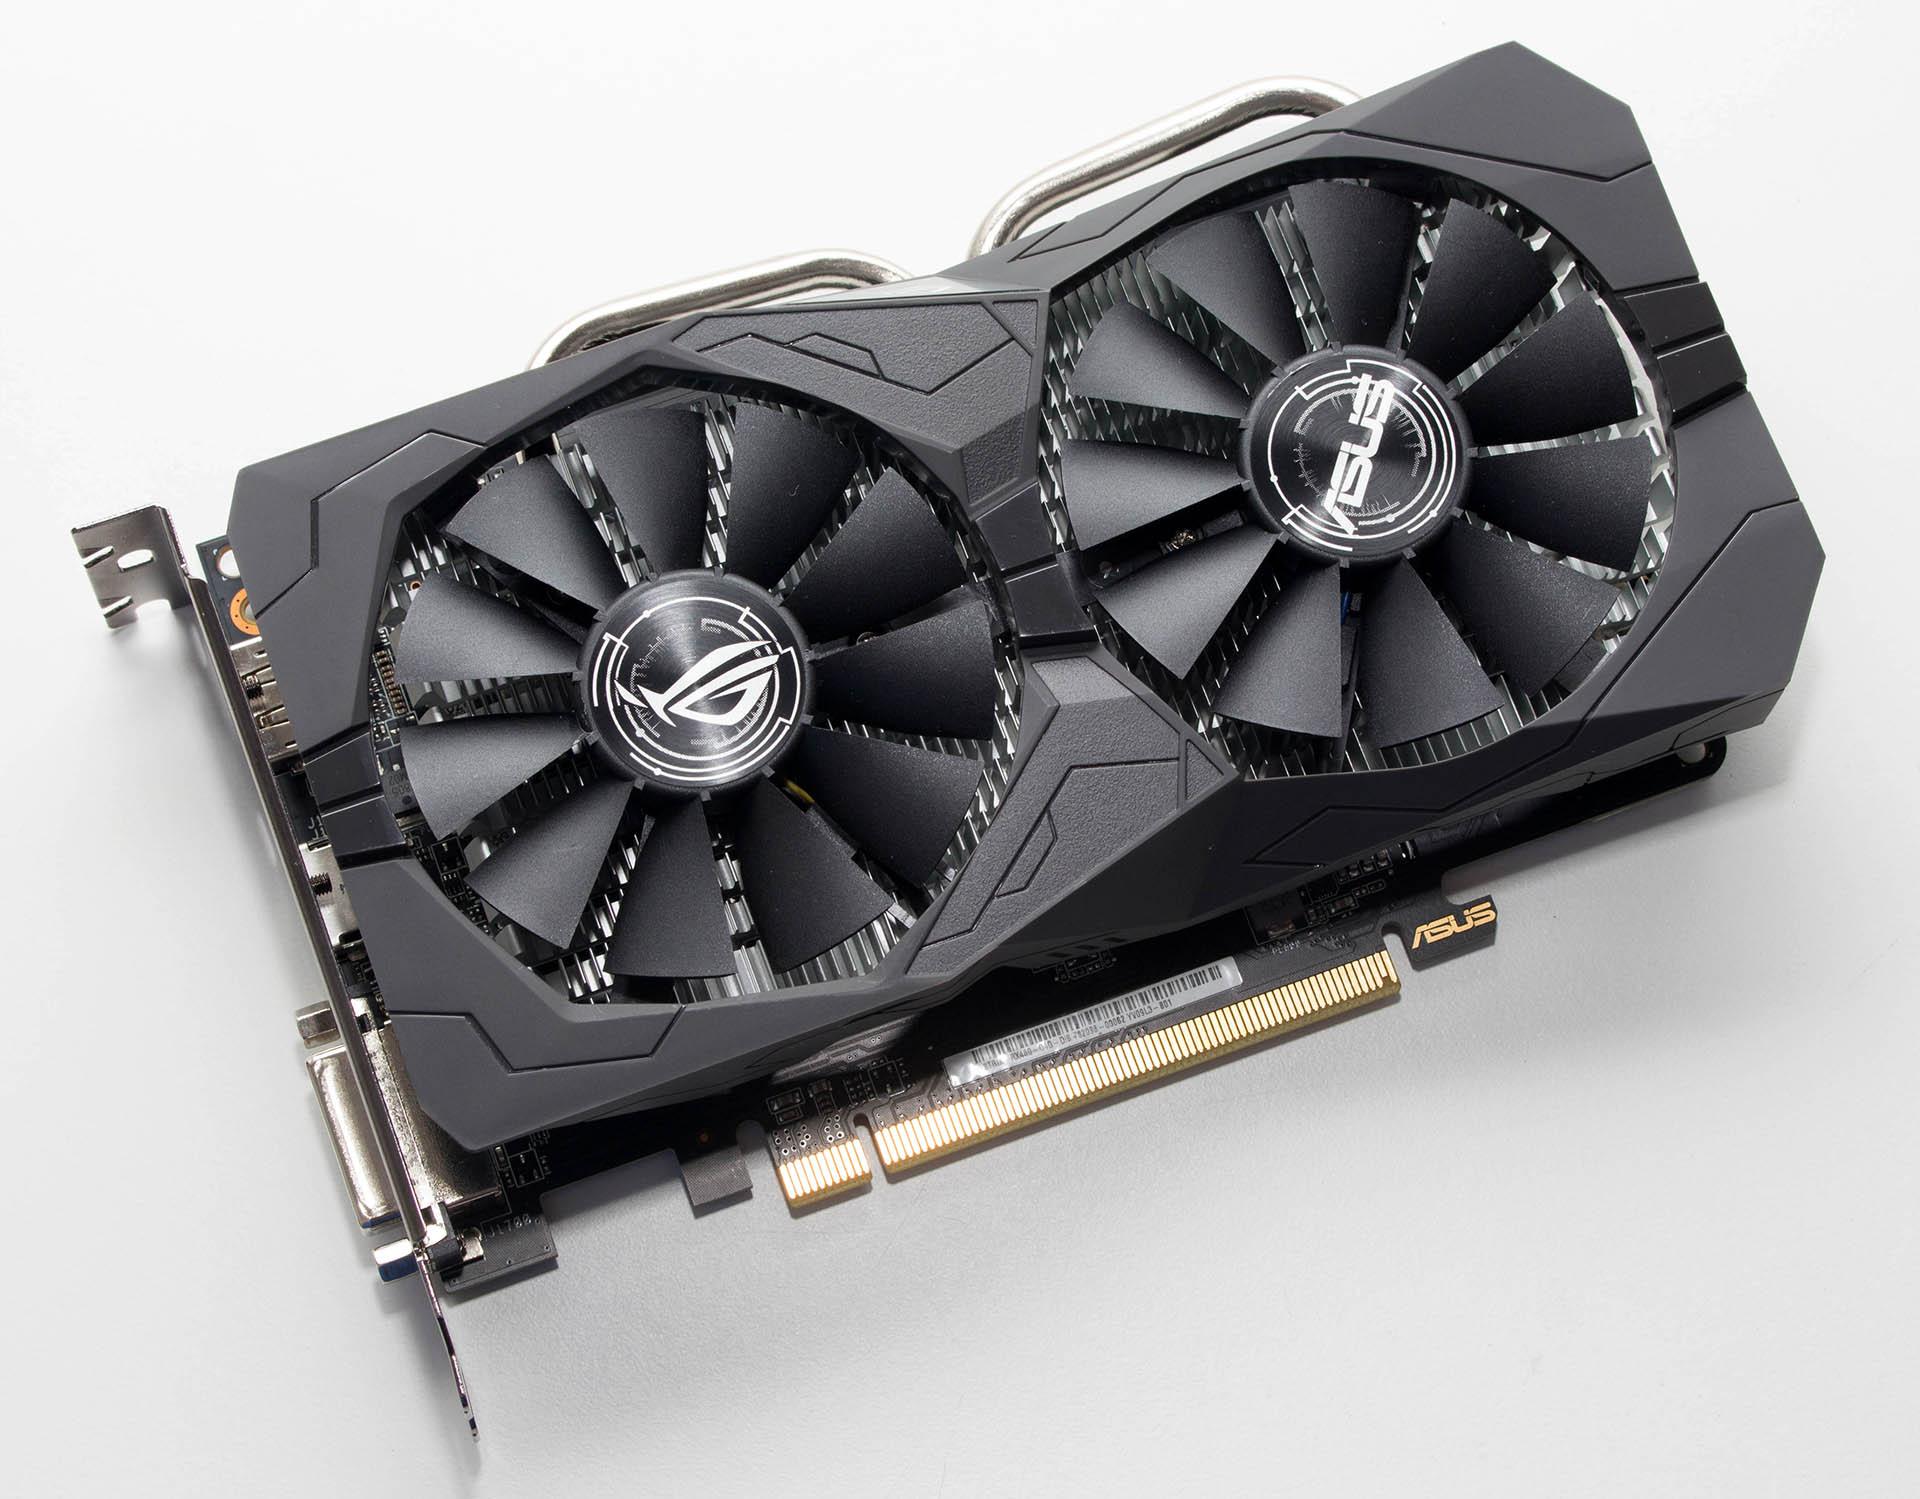 ASUS Radeon RX 460 Strix 4GB – Crossfire test